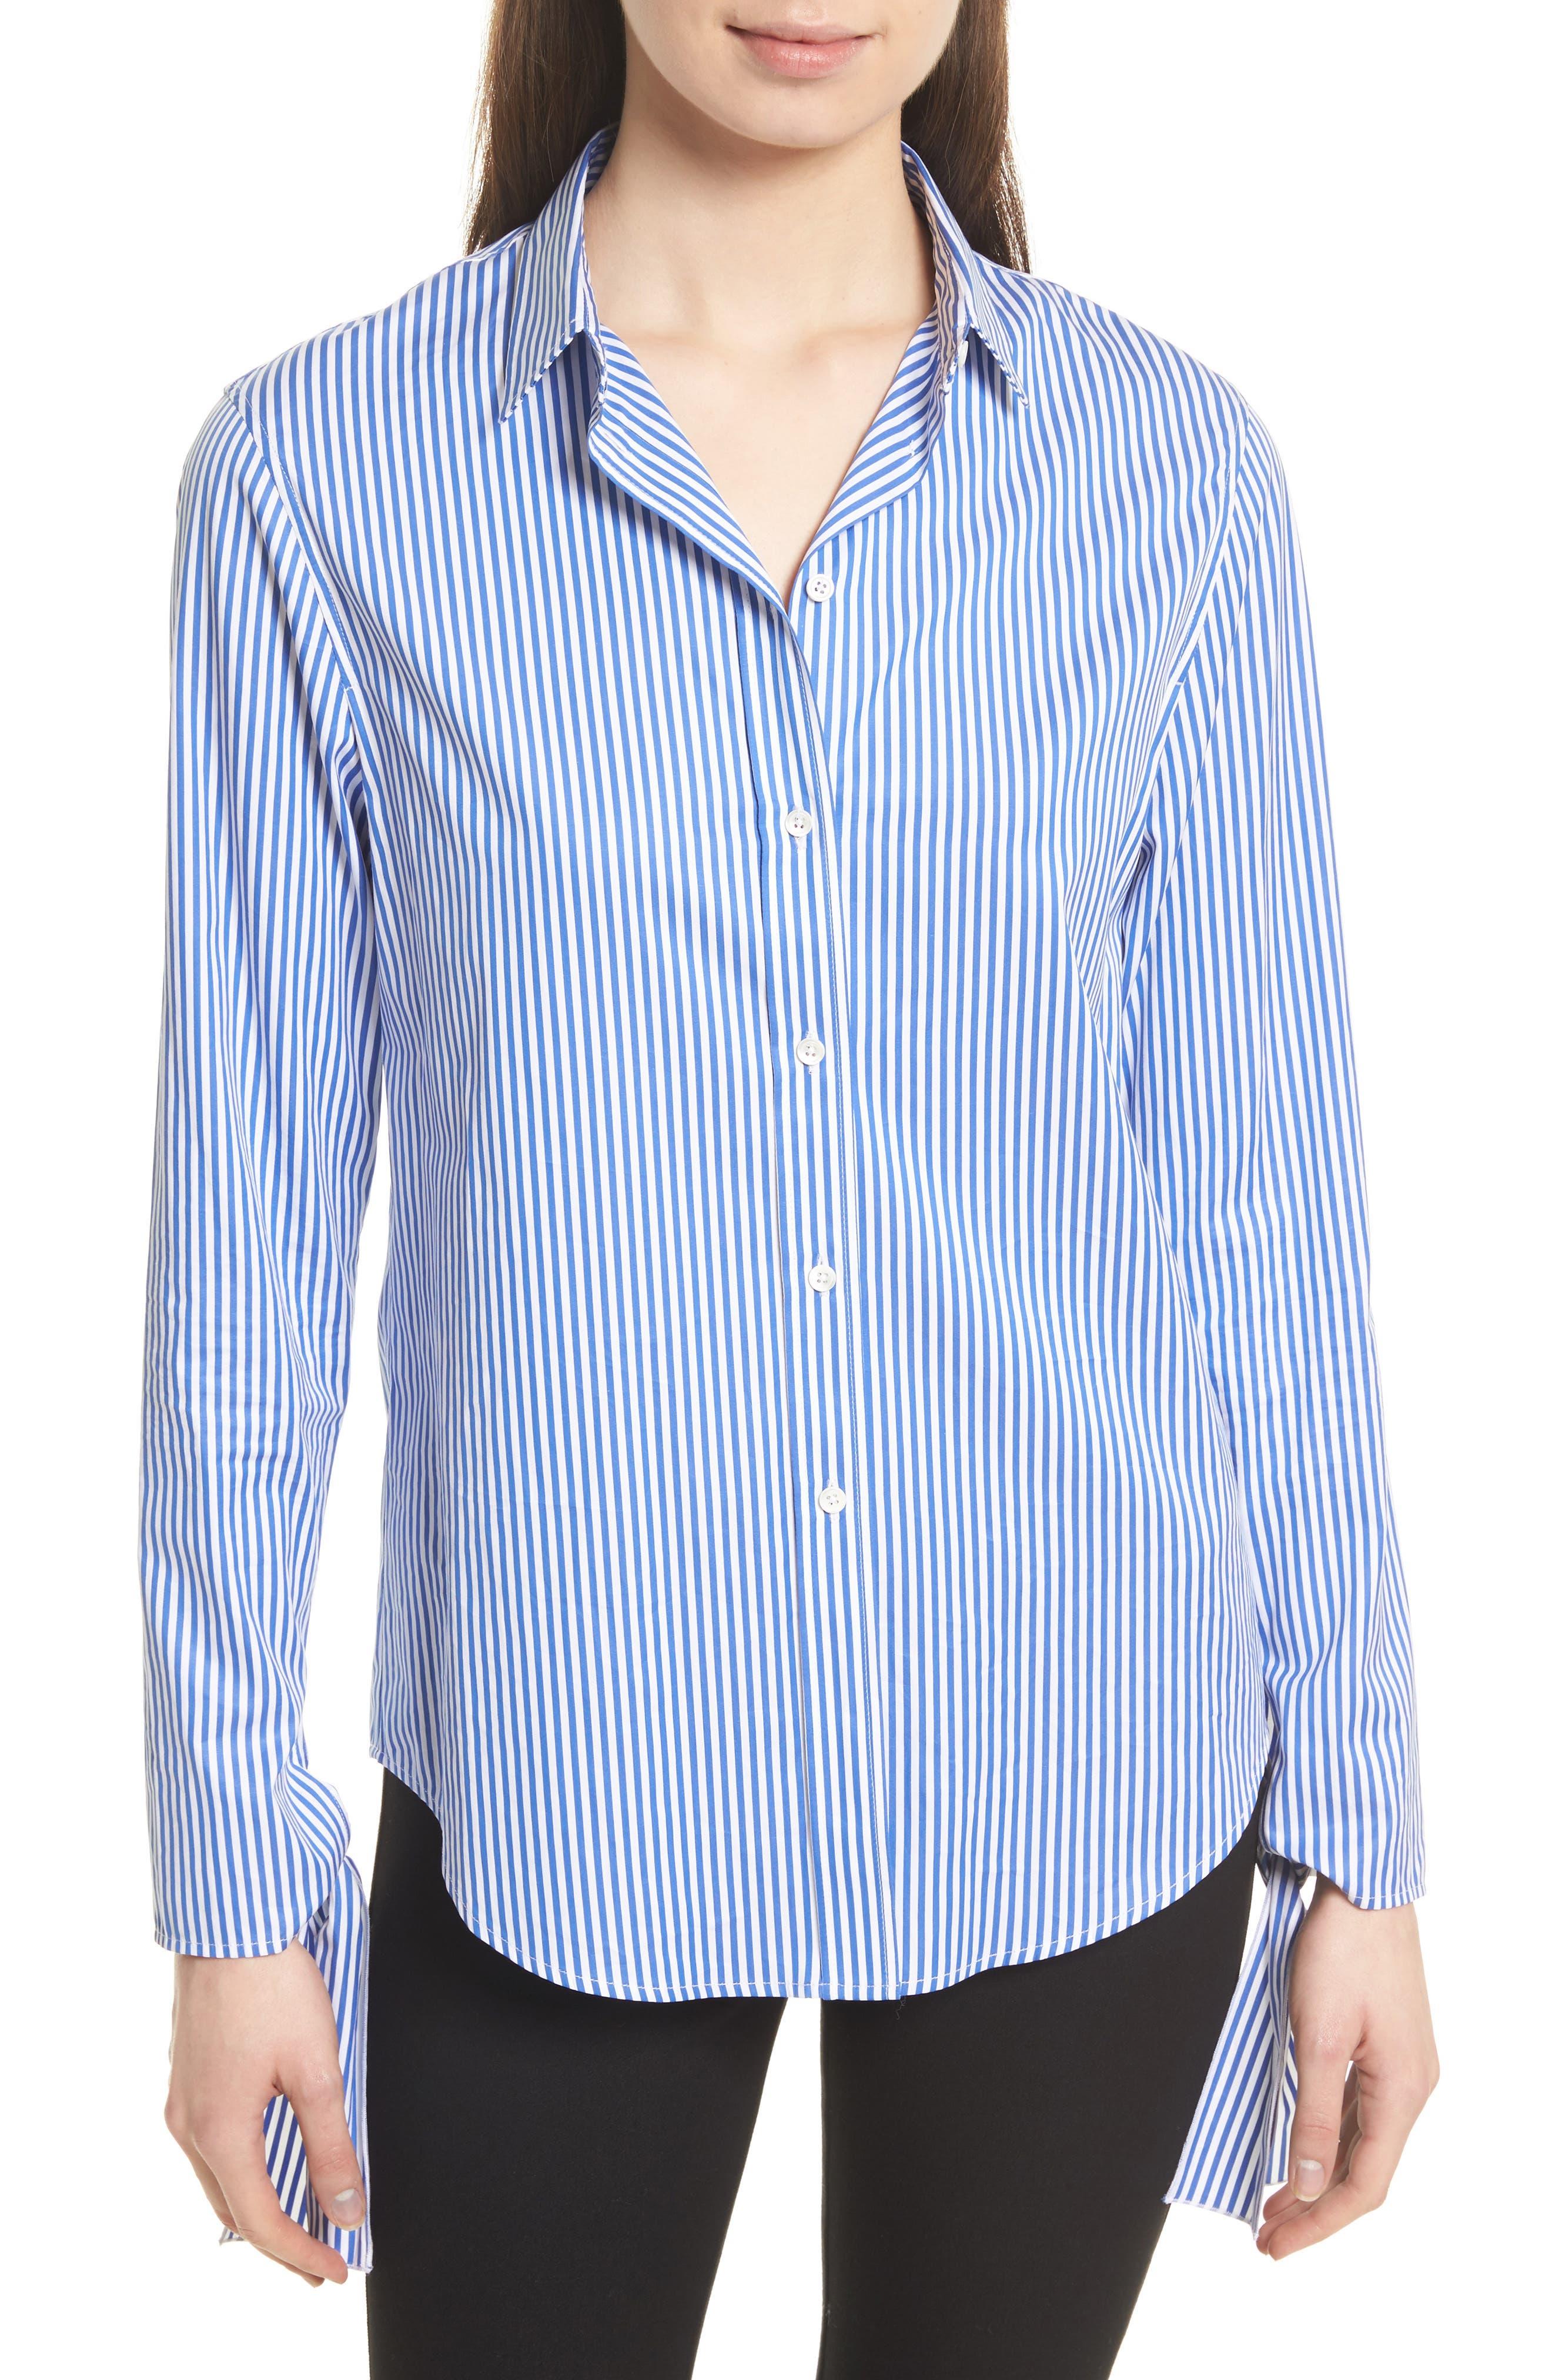 Main Image - JOSEPH Thomas Stripe Forever Tie Cuff Shirt